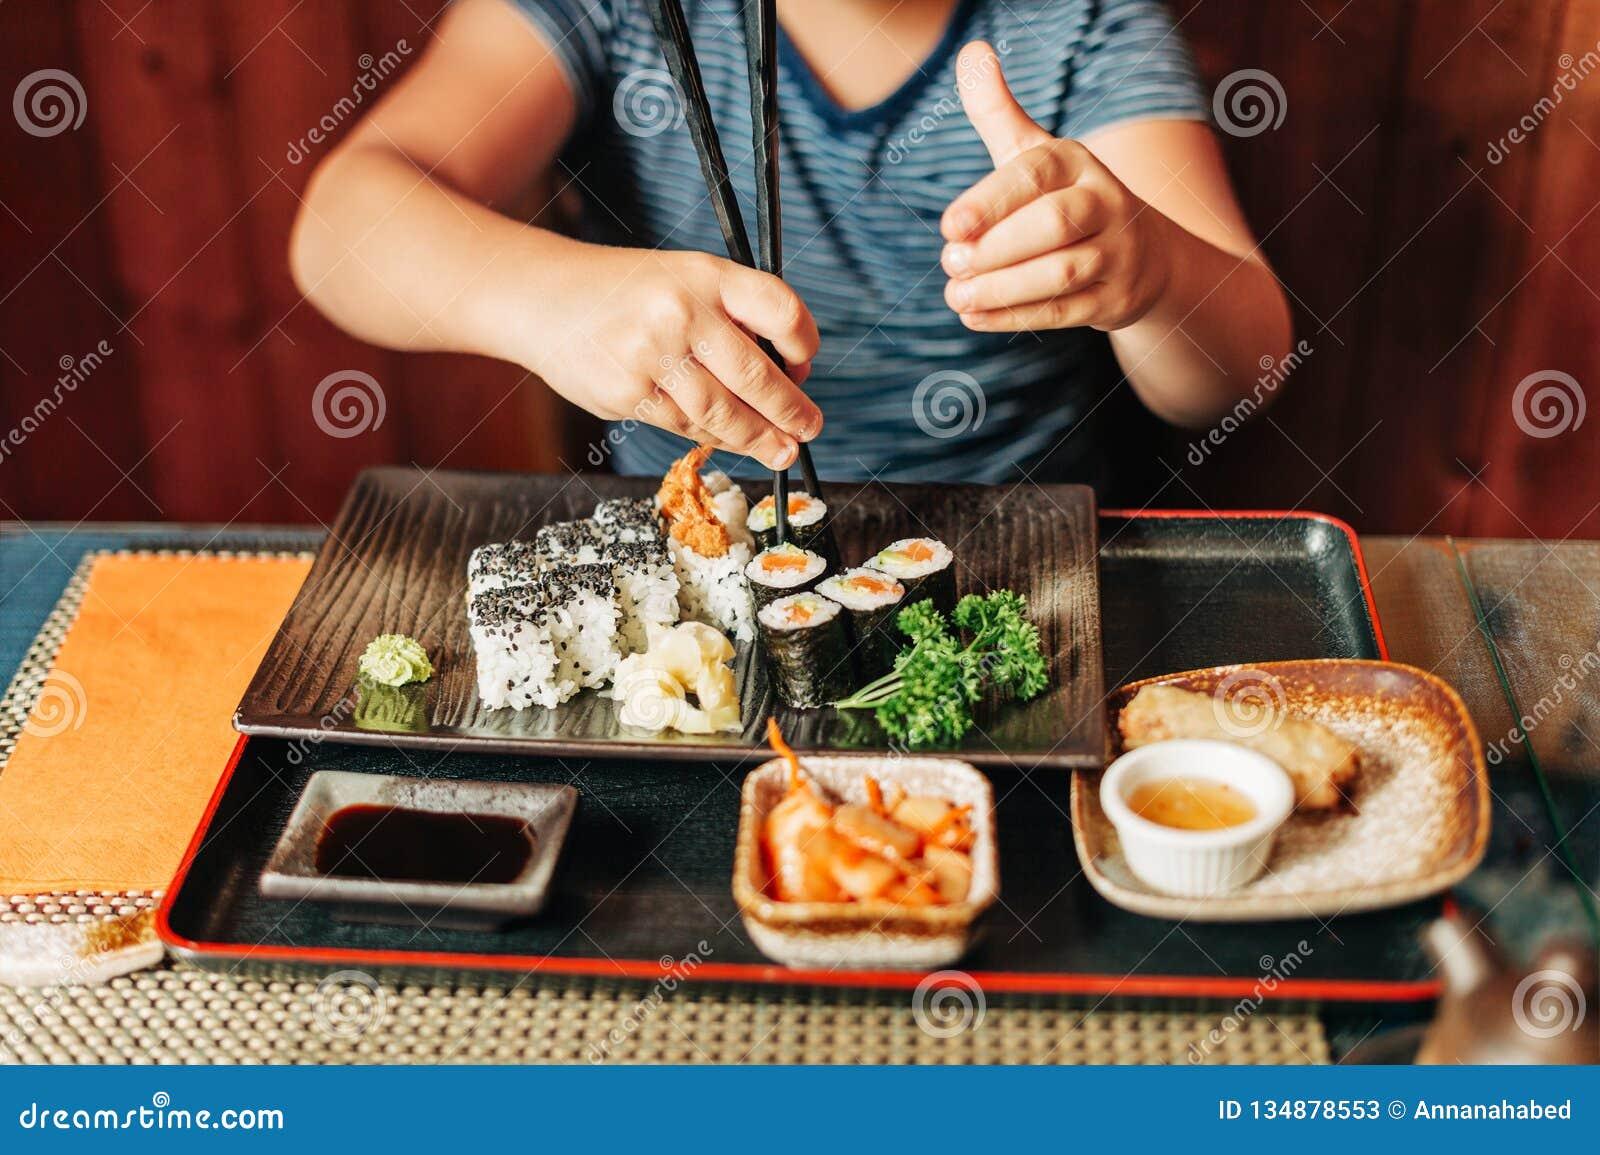 Cute kid boy eating sushi